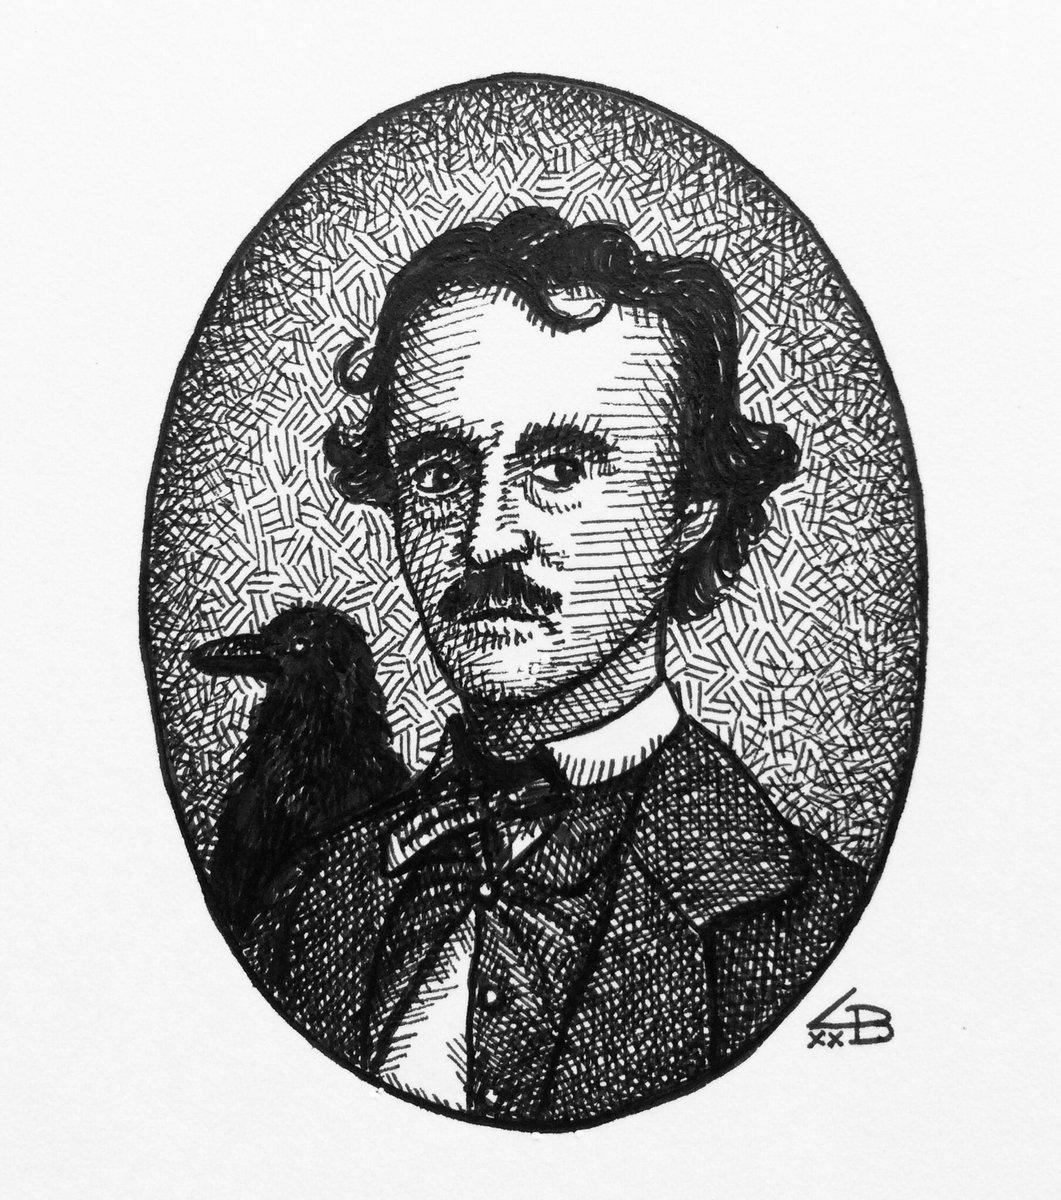 Small Poe portrait.